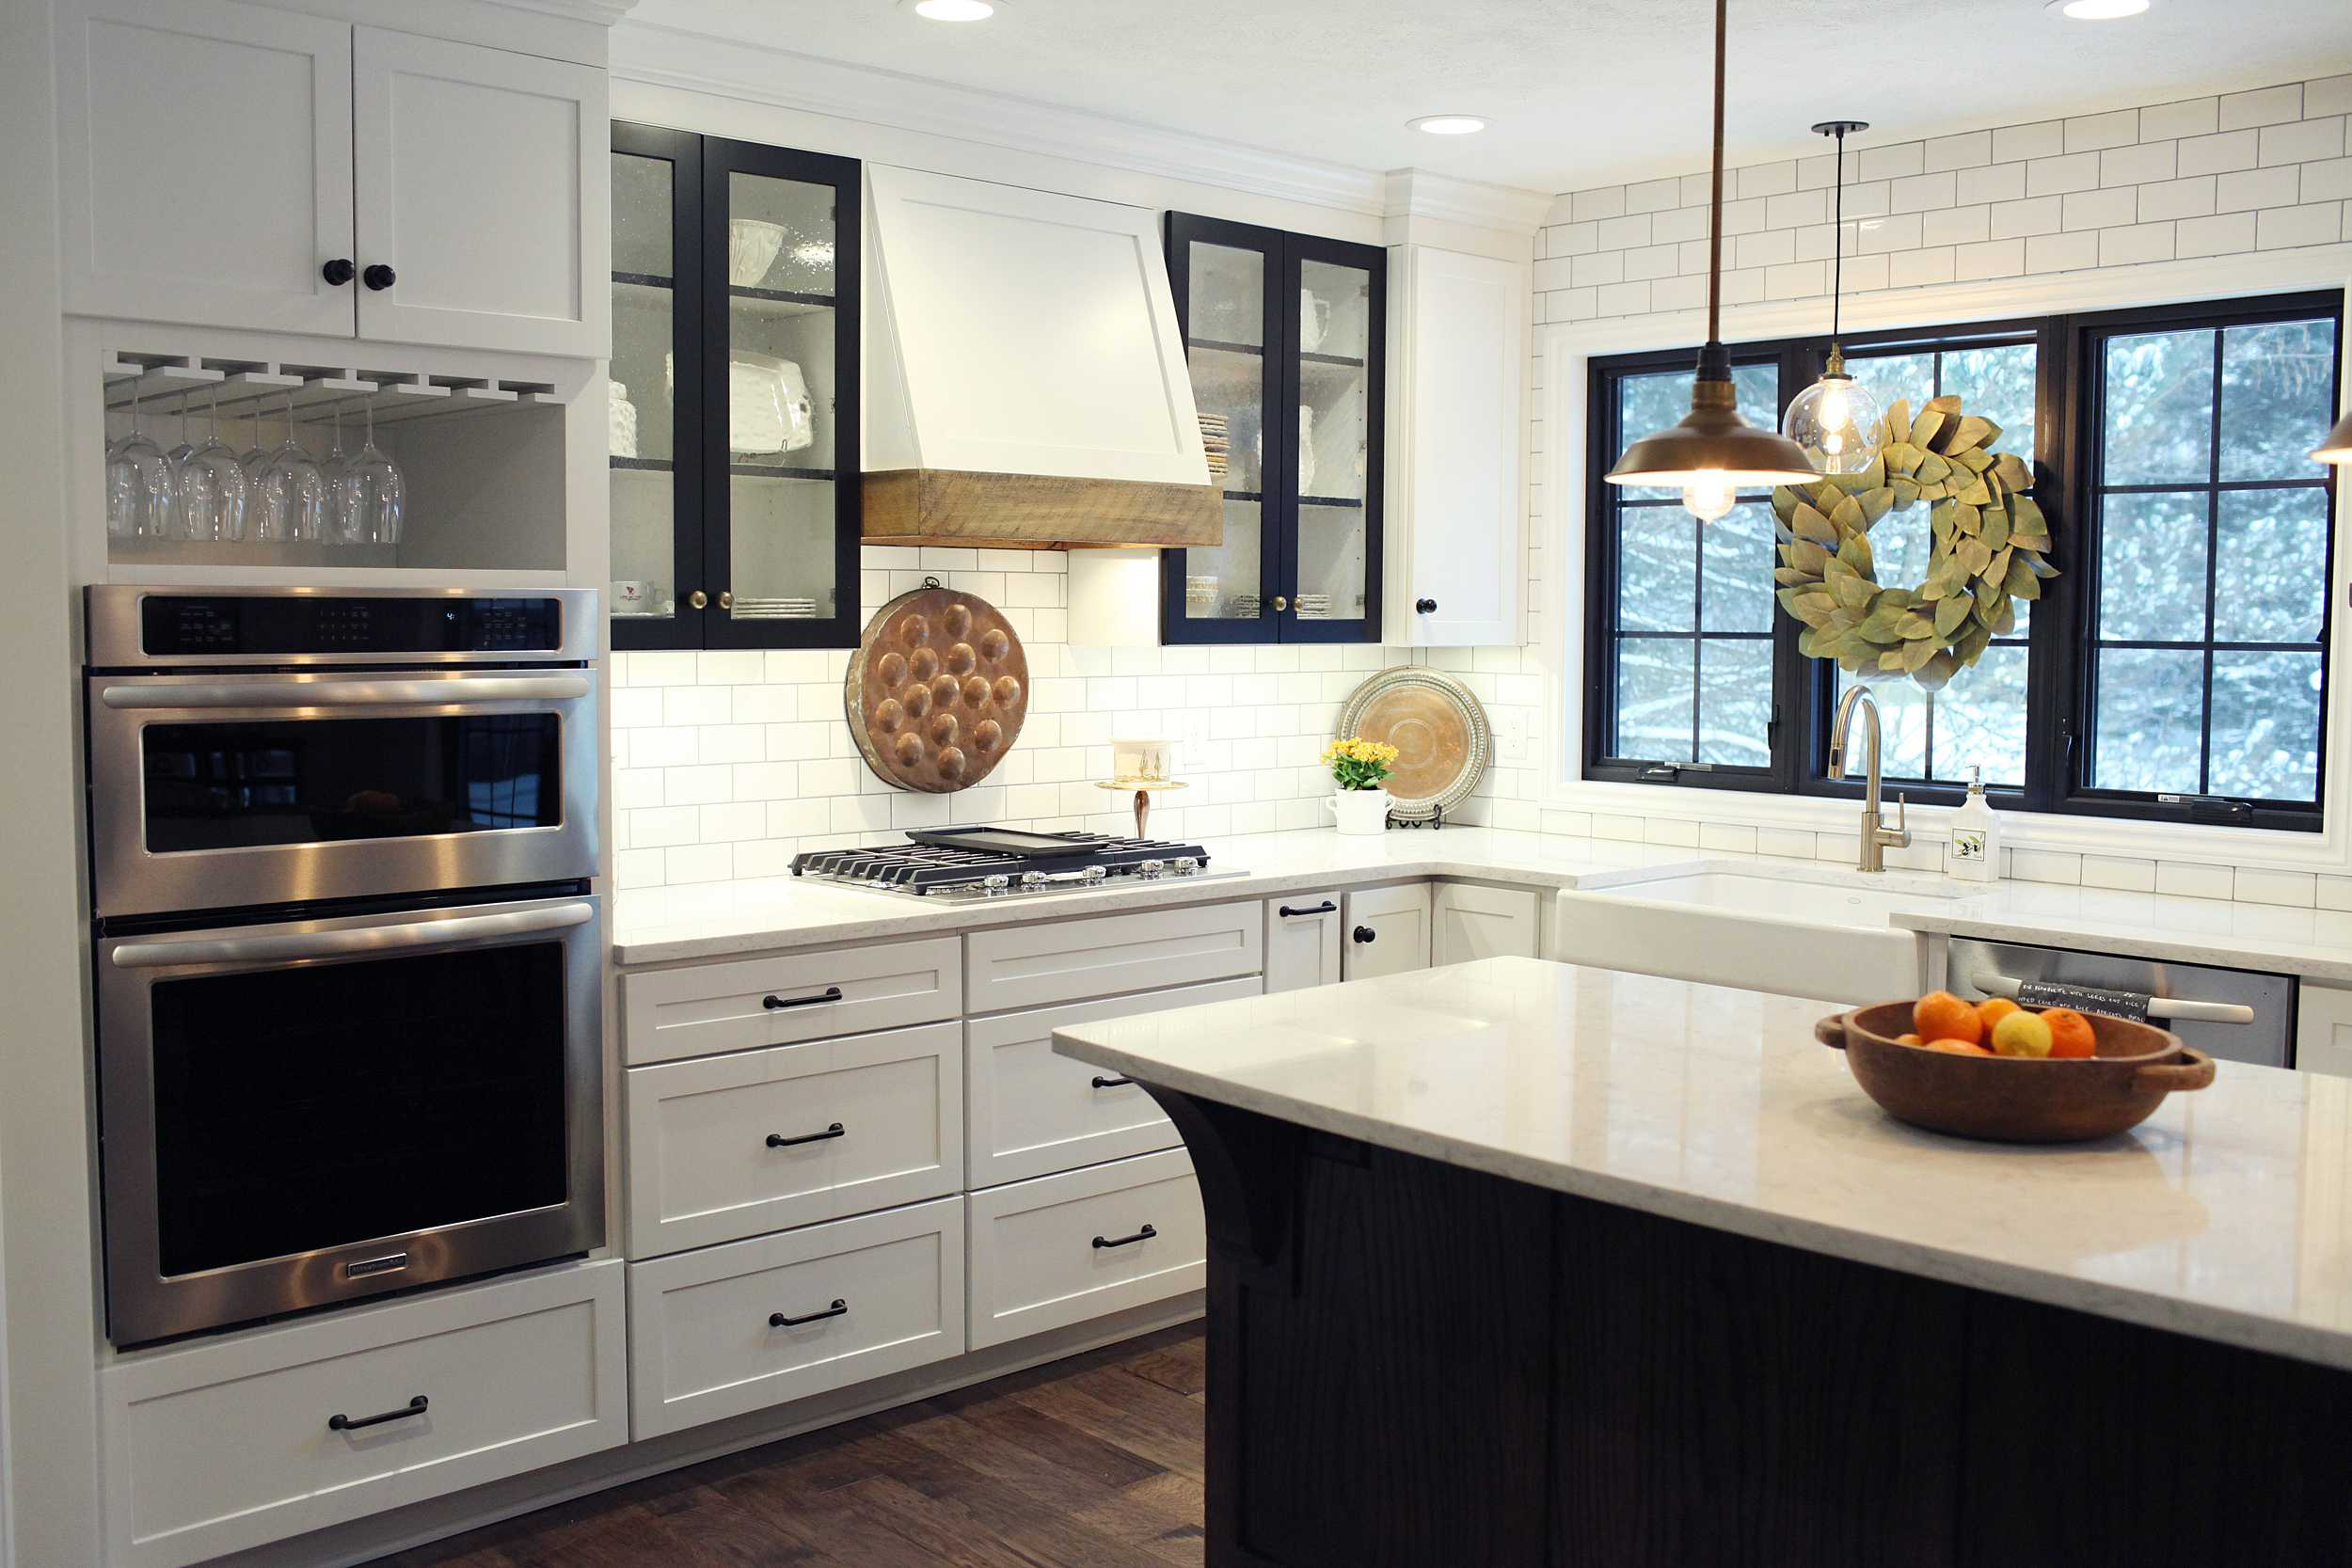 kitchen_remodel (7).jpg